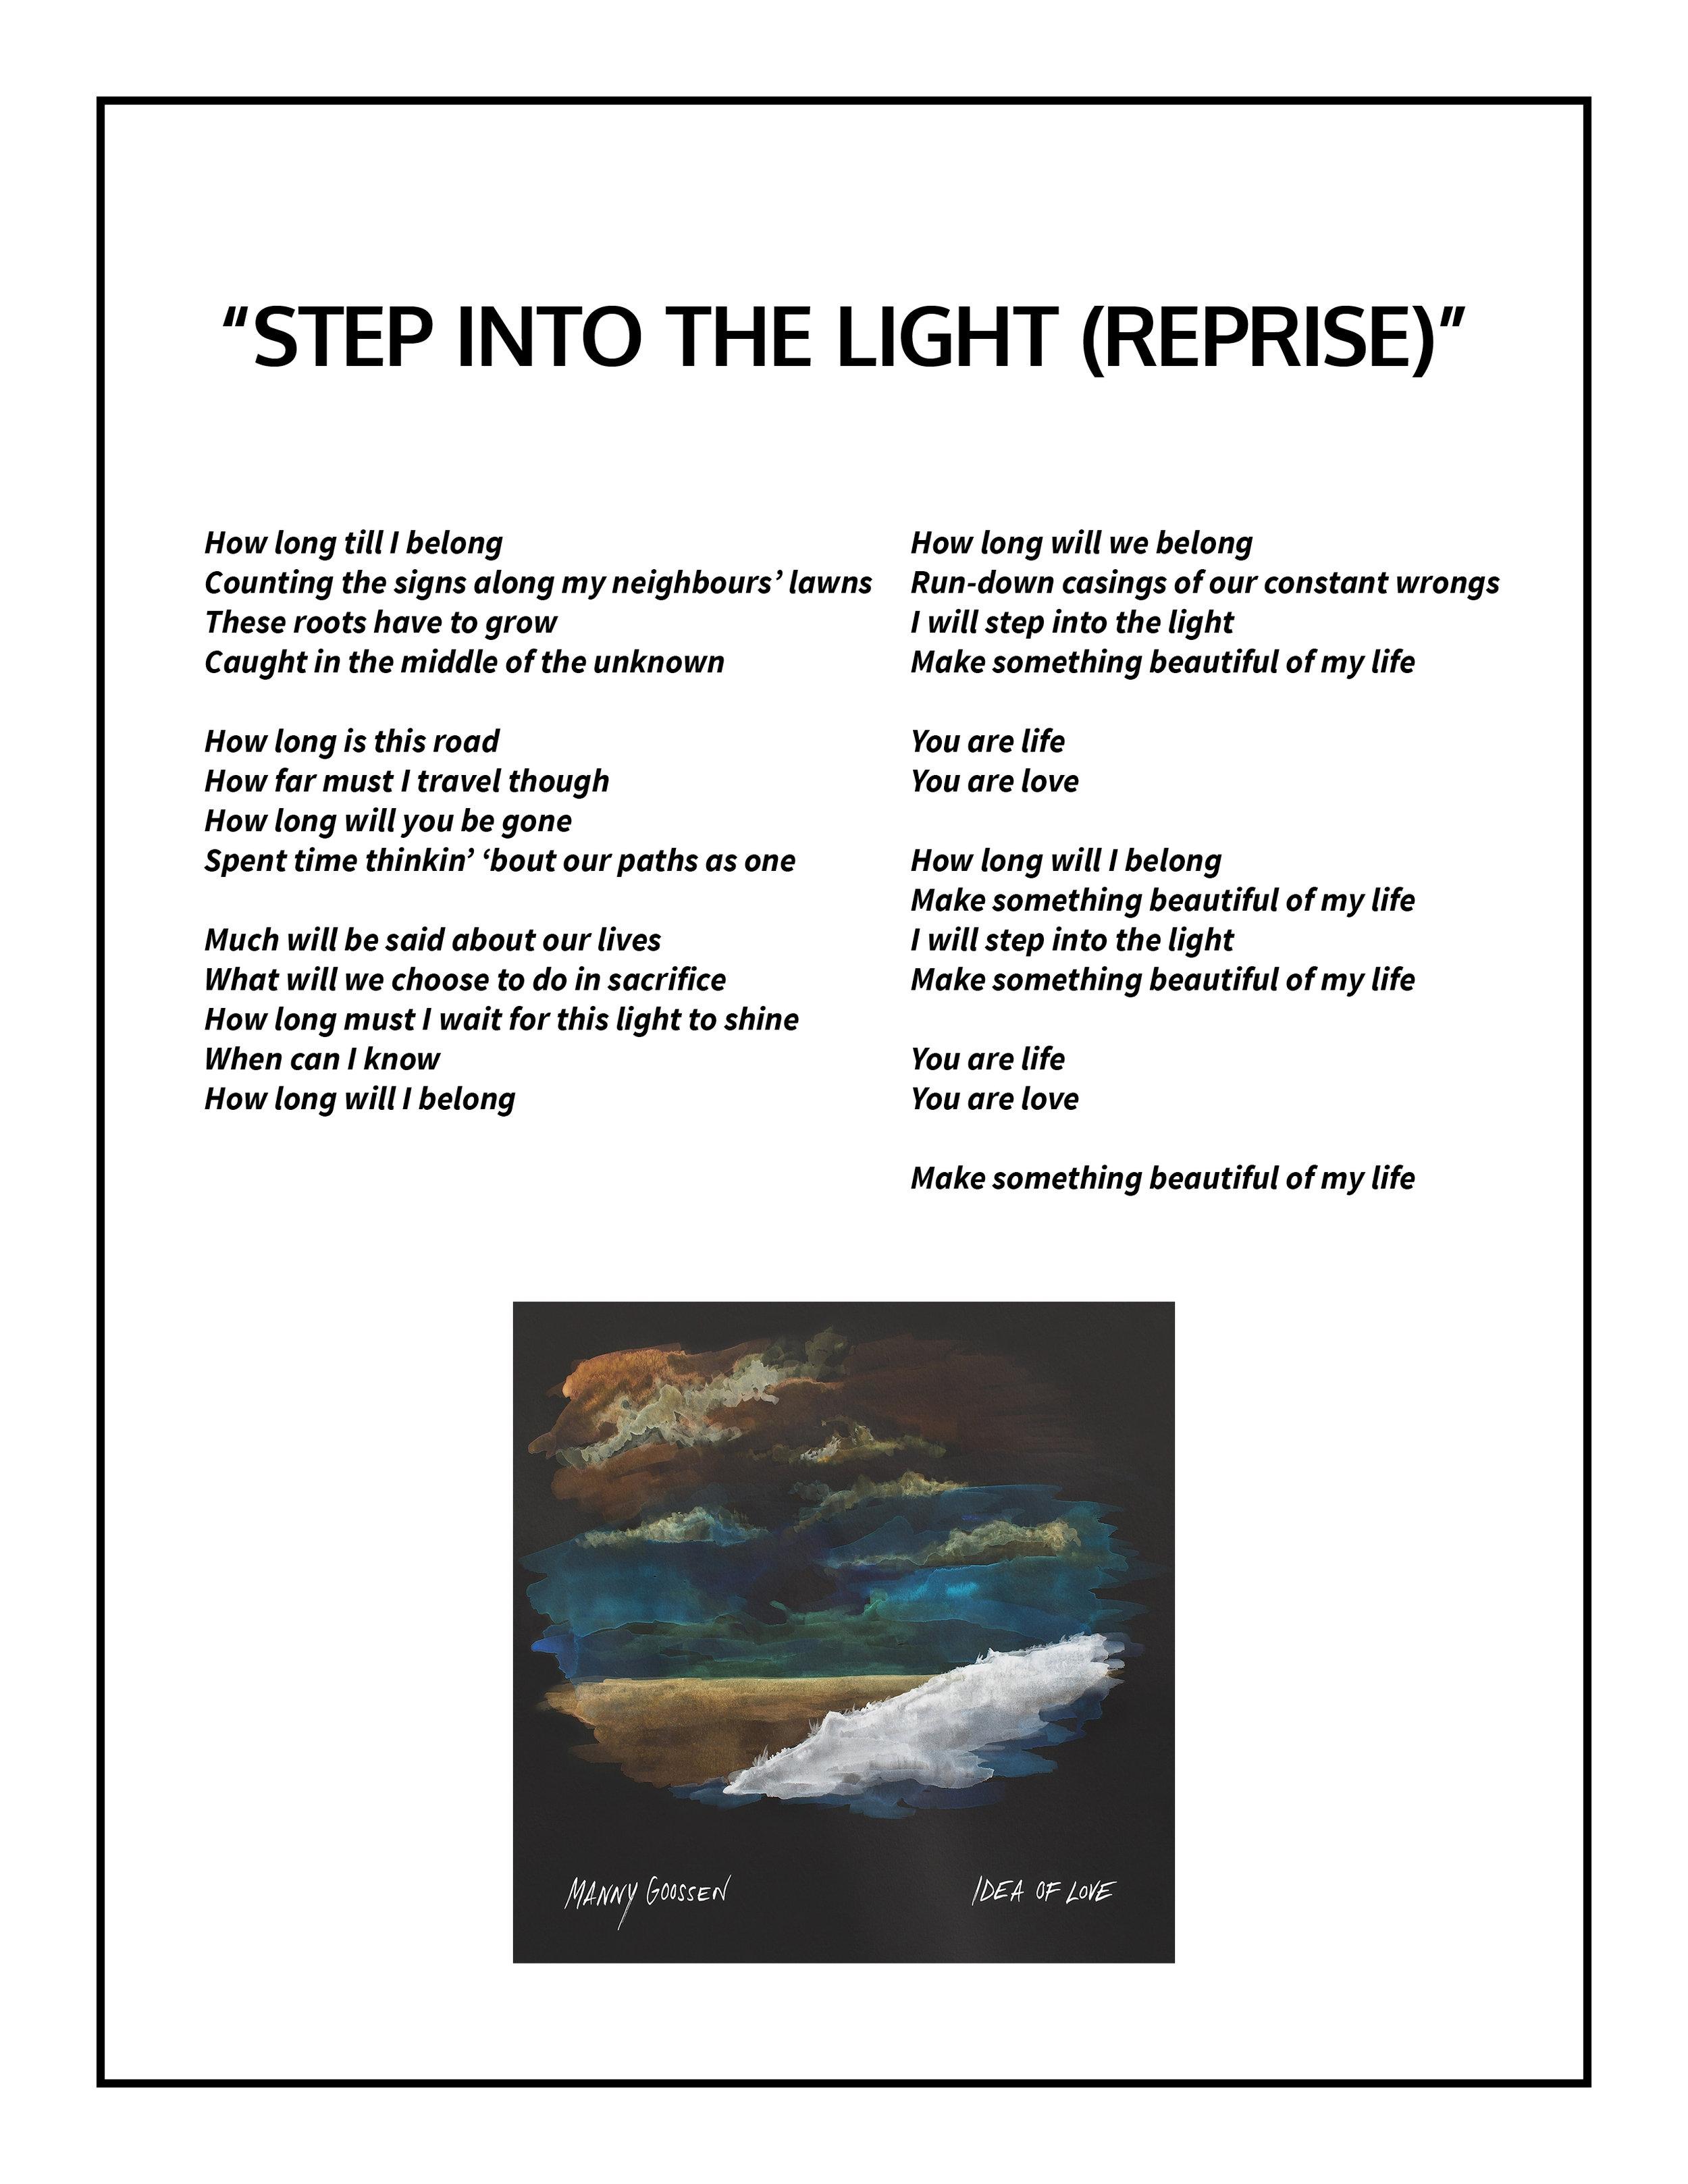 Step Into the Light (Reprise) Lyrics